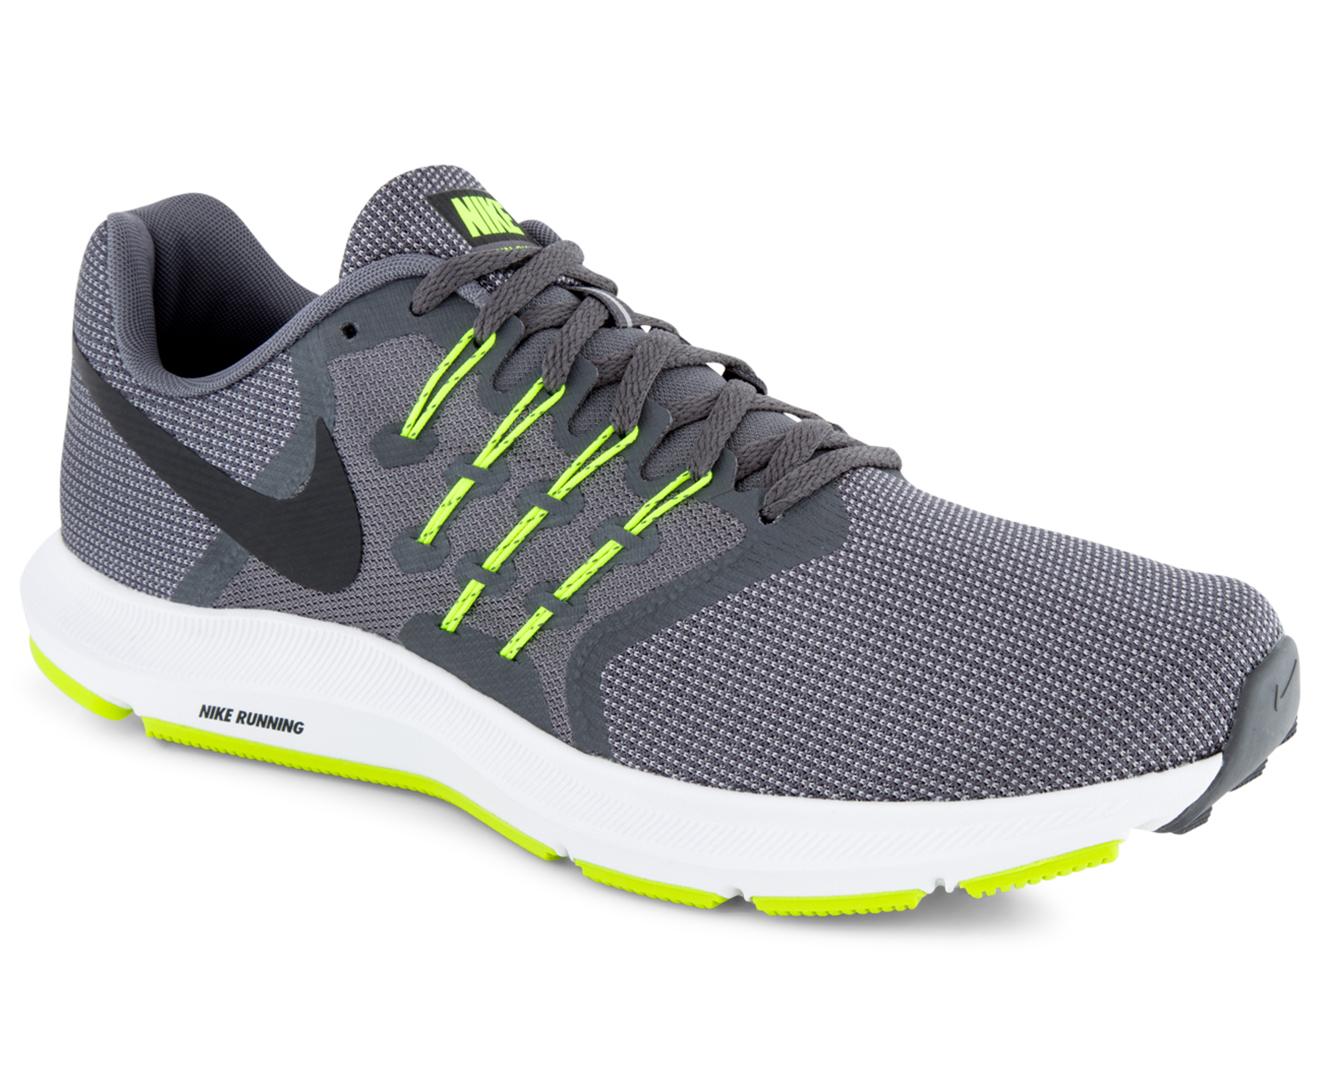 2310df1c95f Nike Men's Run Swift Shoe - Cool Grey/Black-Volt-White